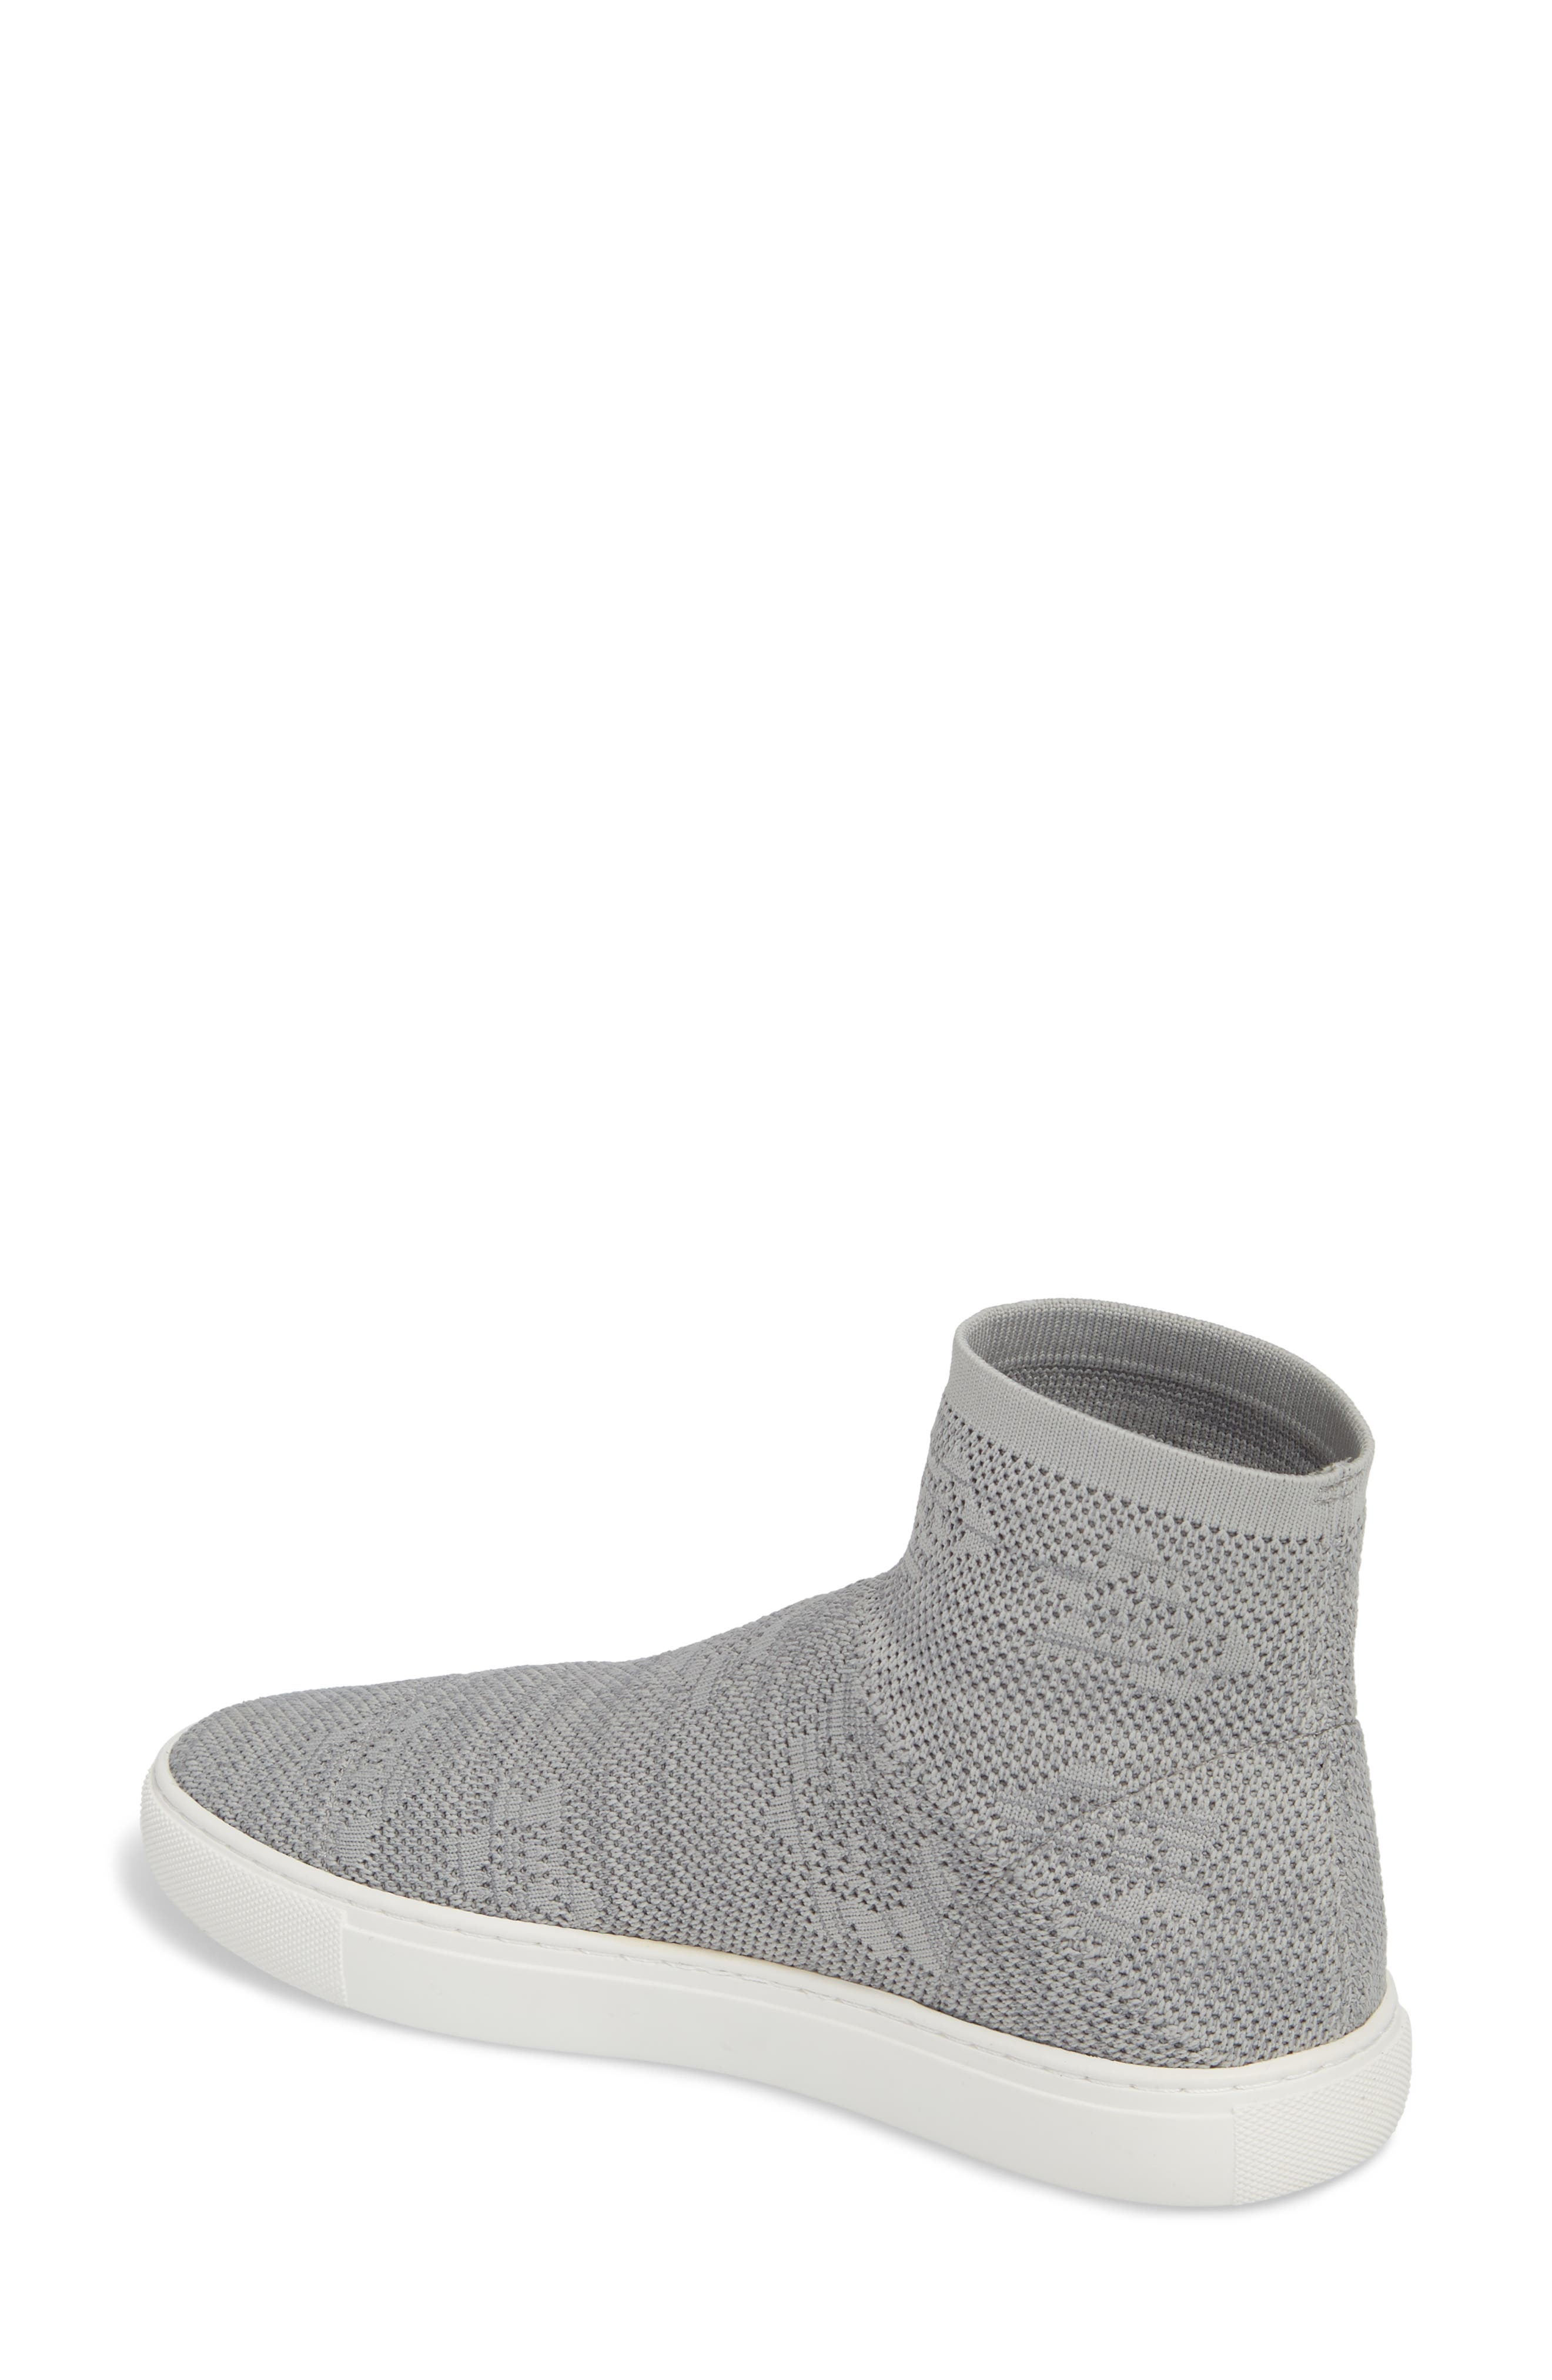 Keating Sneaker,                             Alternate thumbnail 5, color,